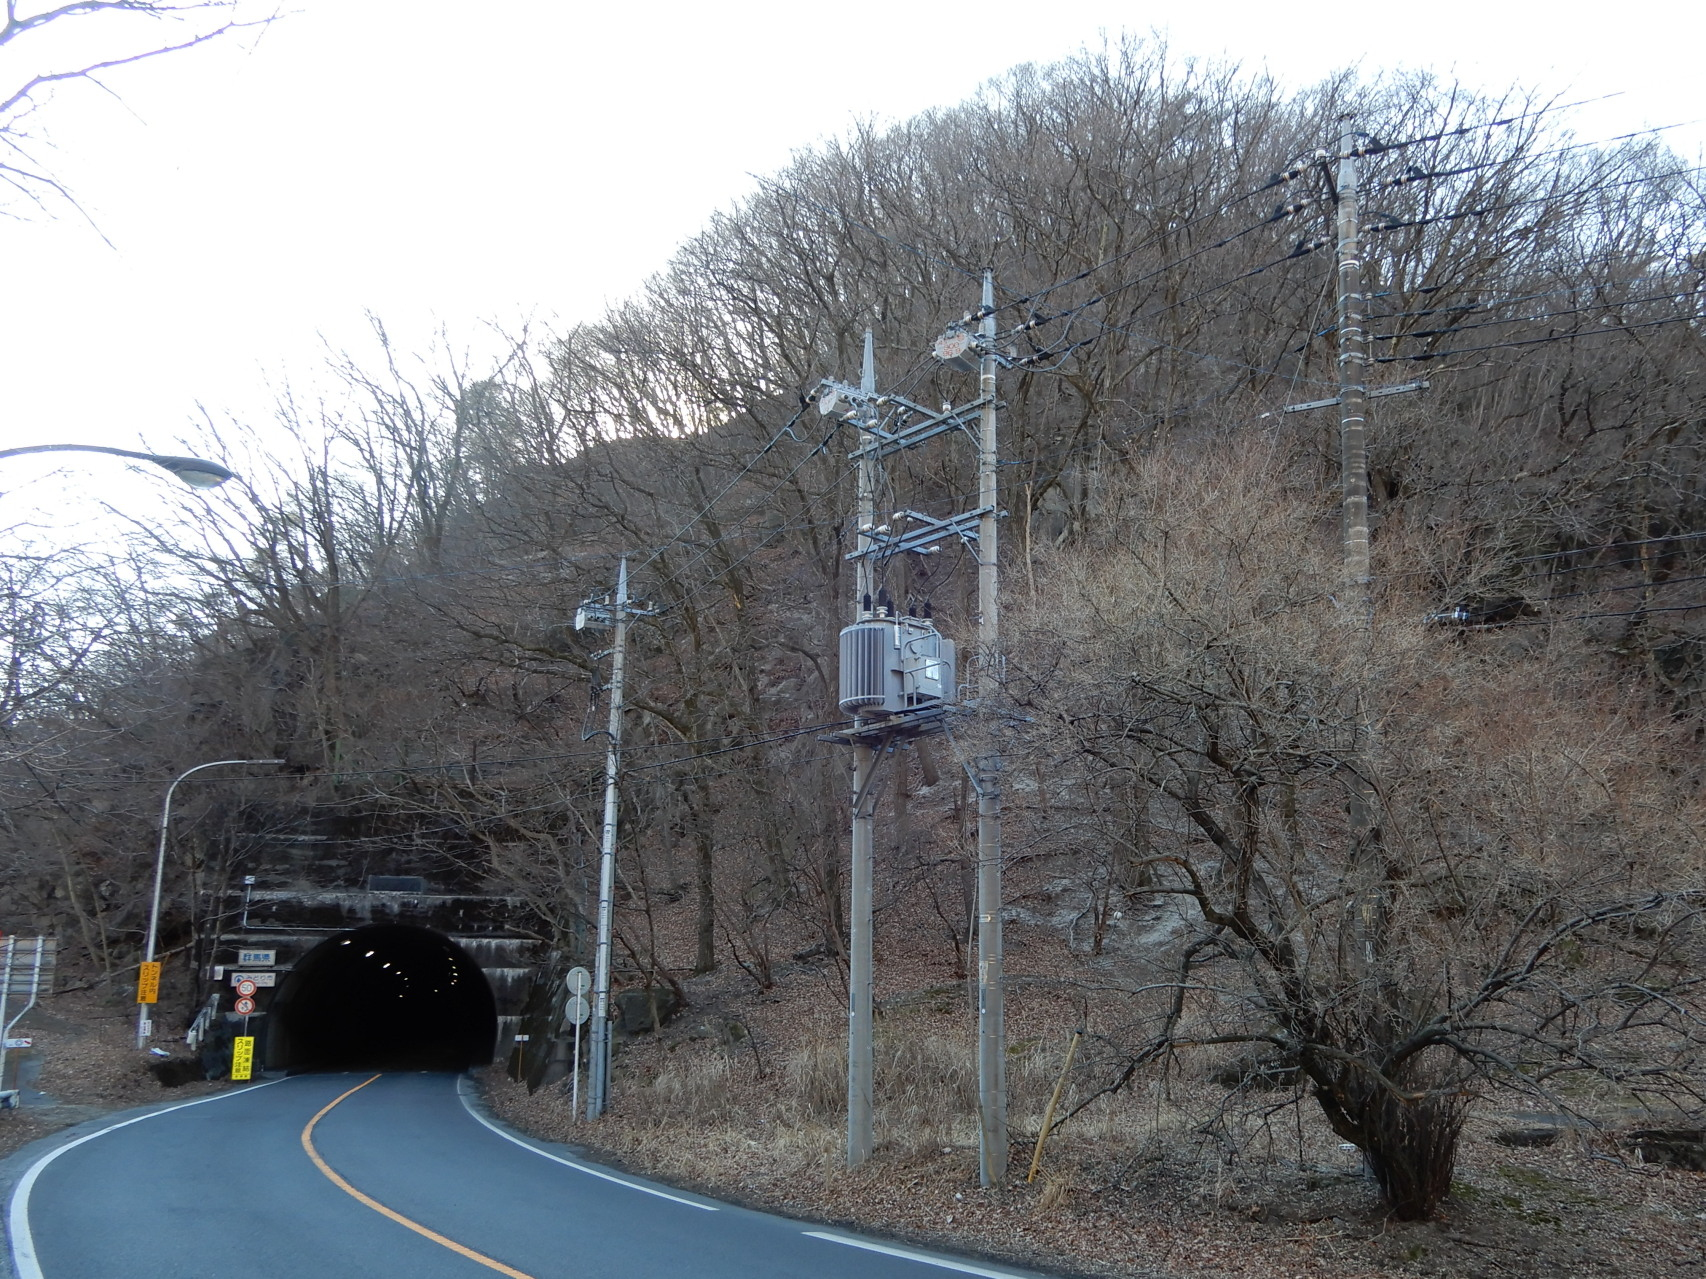 a25-2 沢入トンネルと大名峠 (トンネルの上を馬で越した、脇の旧国道には明治期の碑がある)